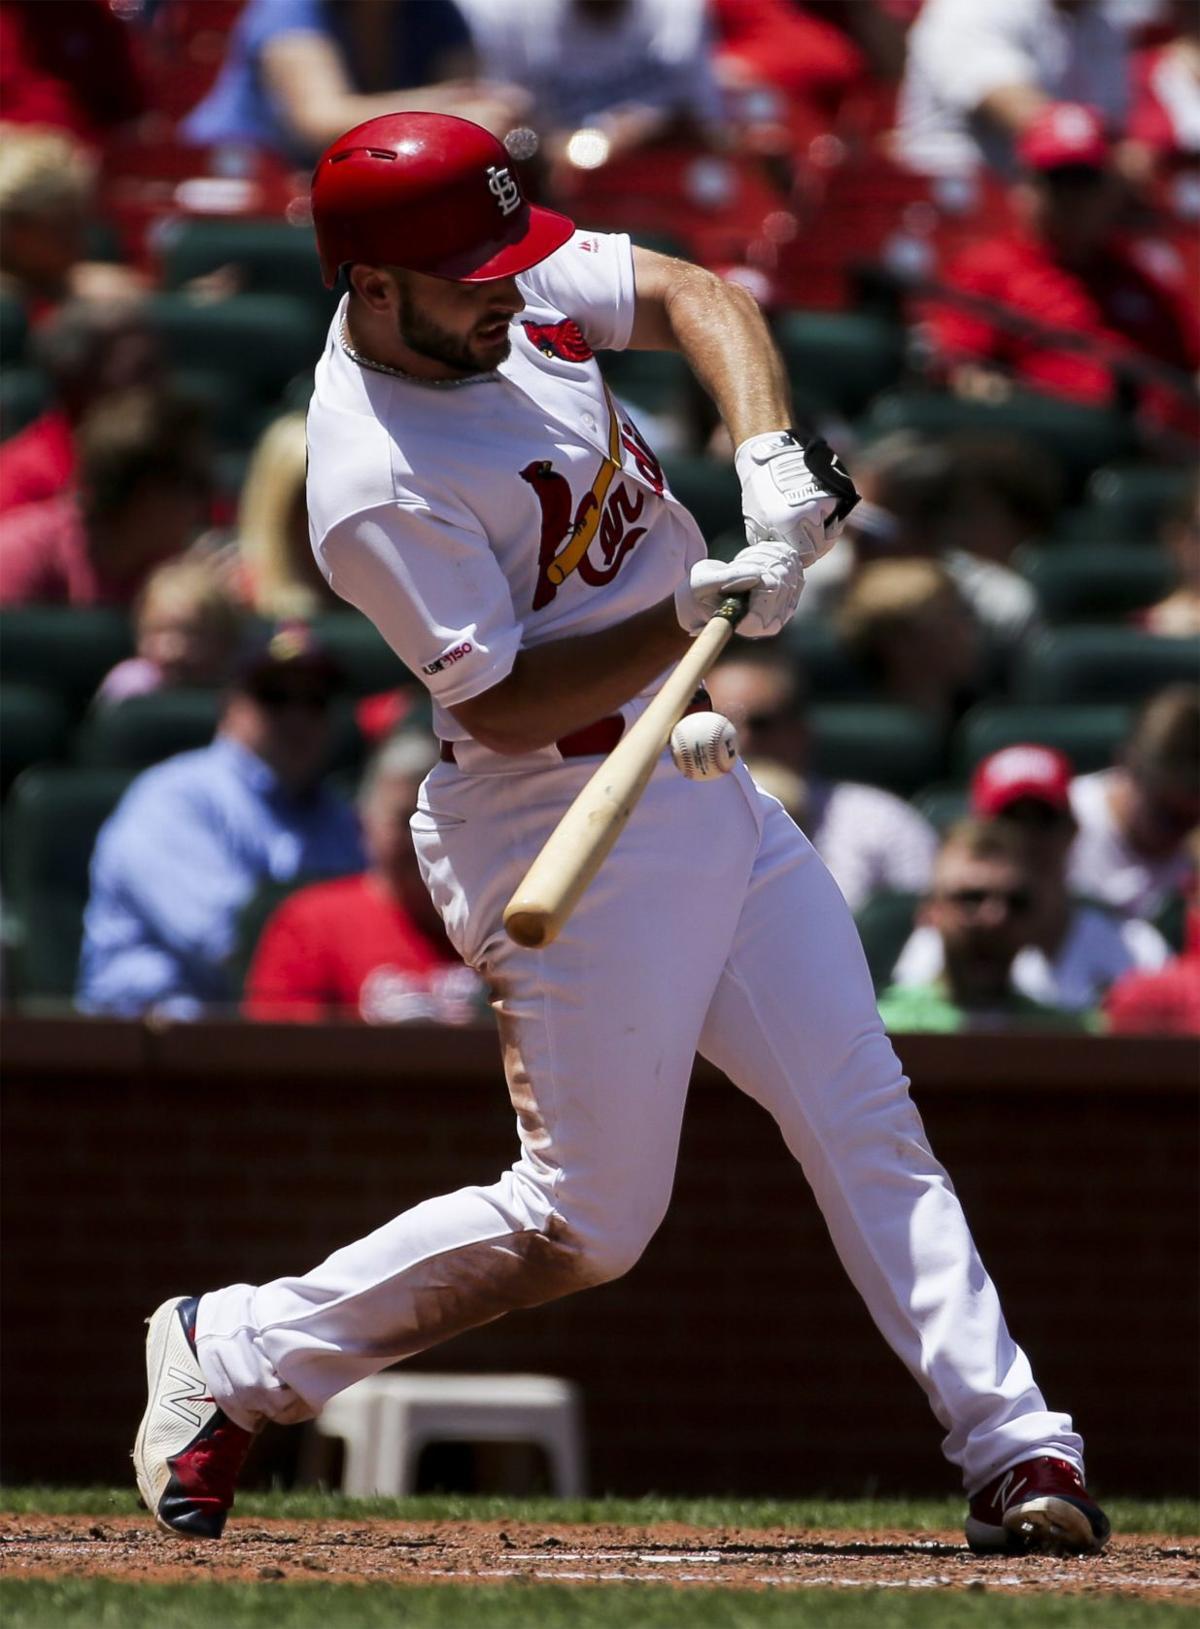 Cardinals start Royals series